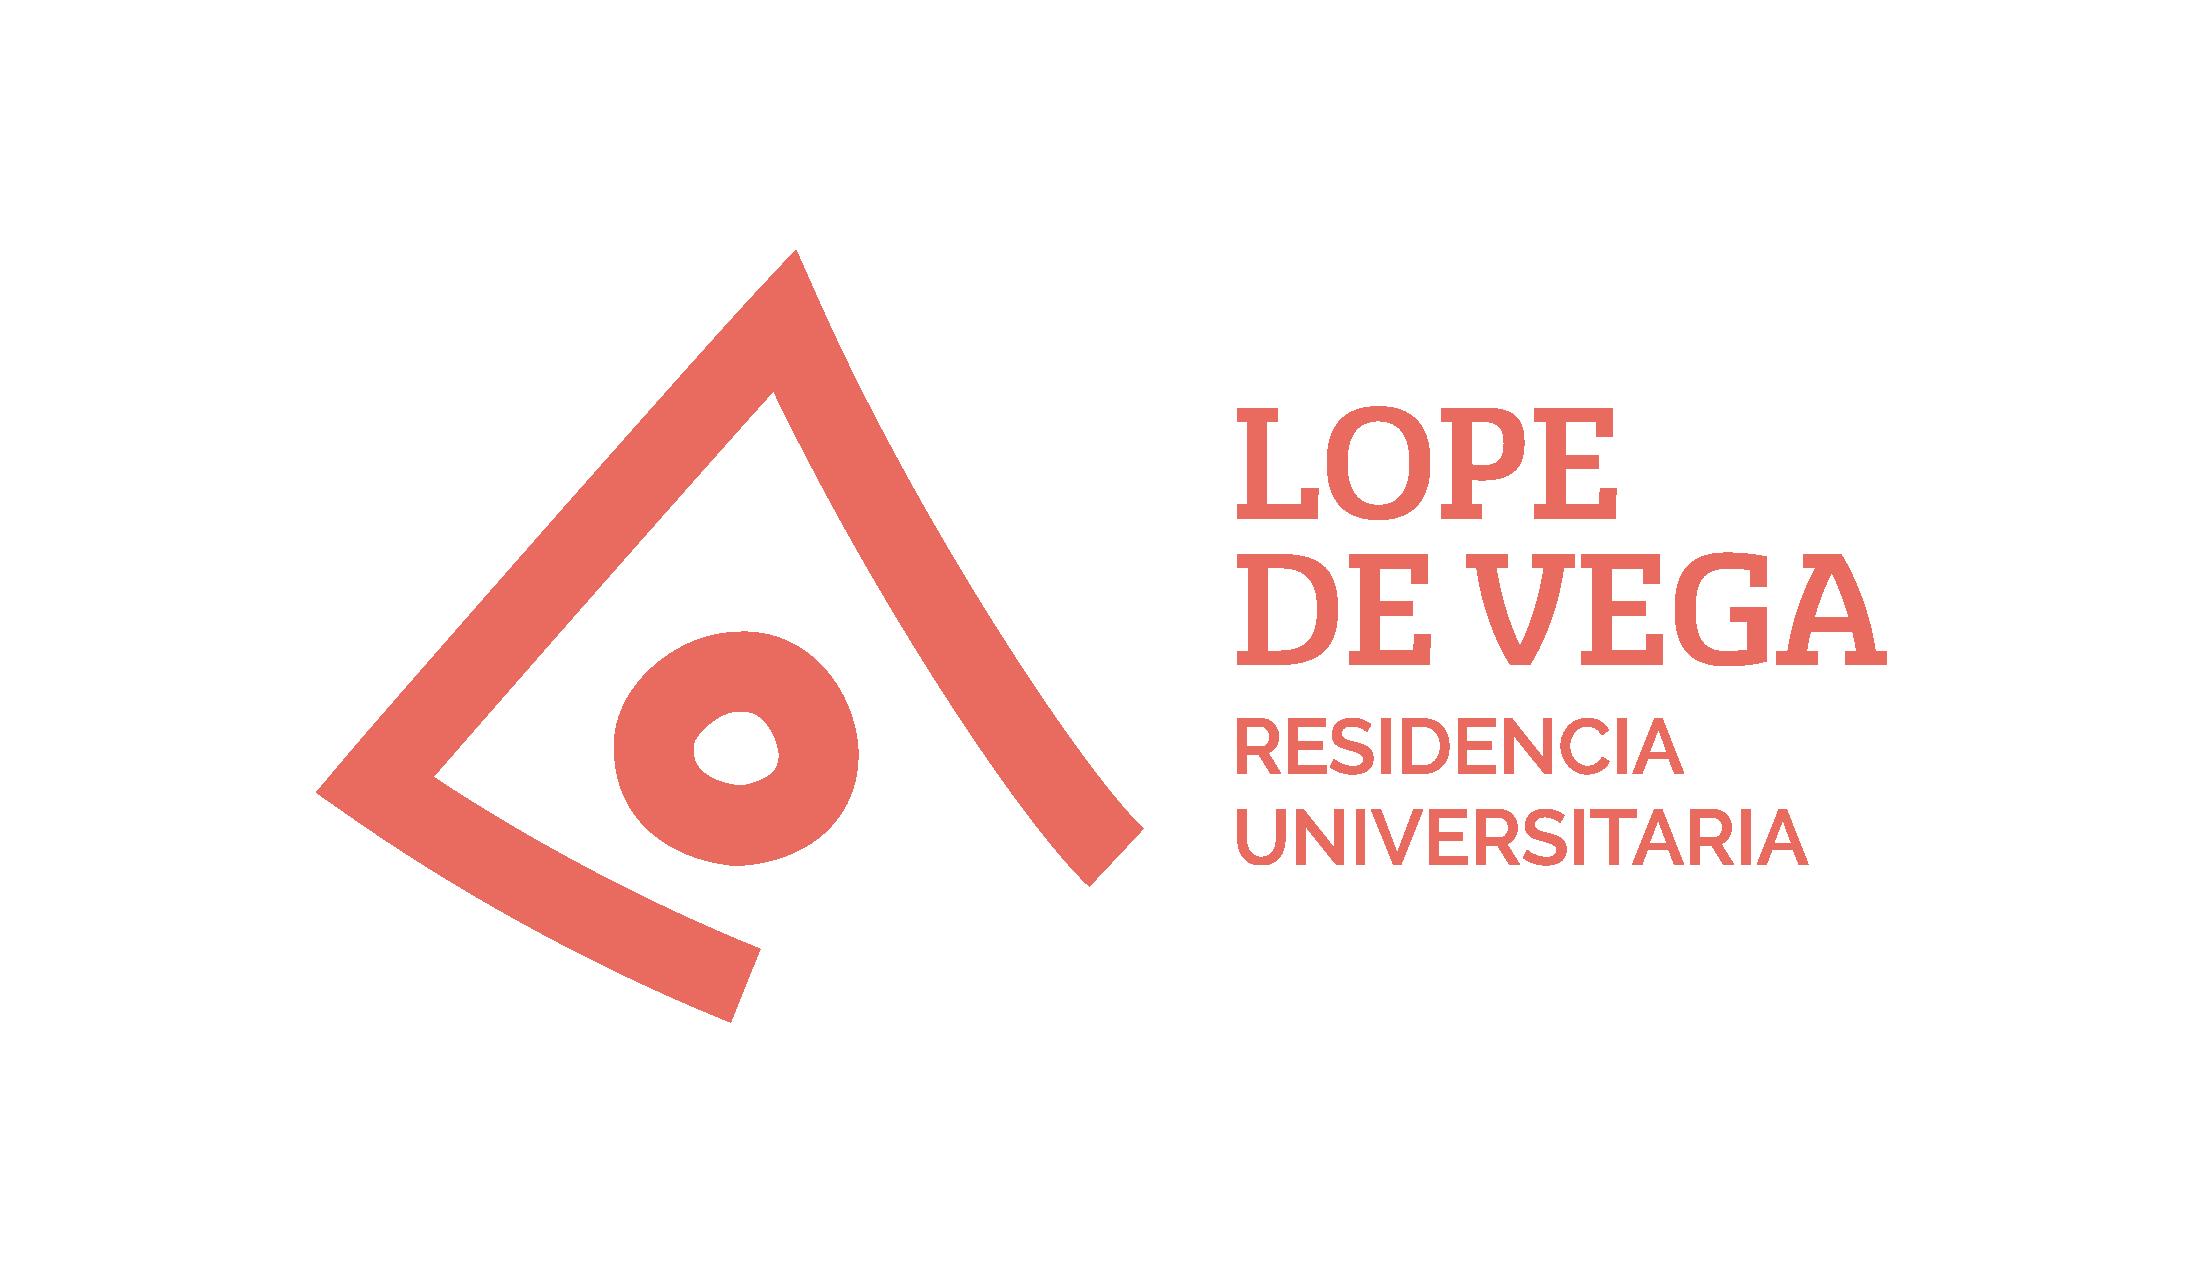 Residencia Universitaria Lope de Vega